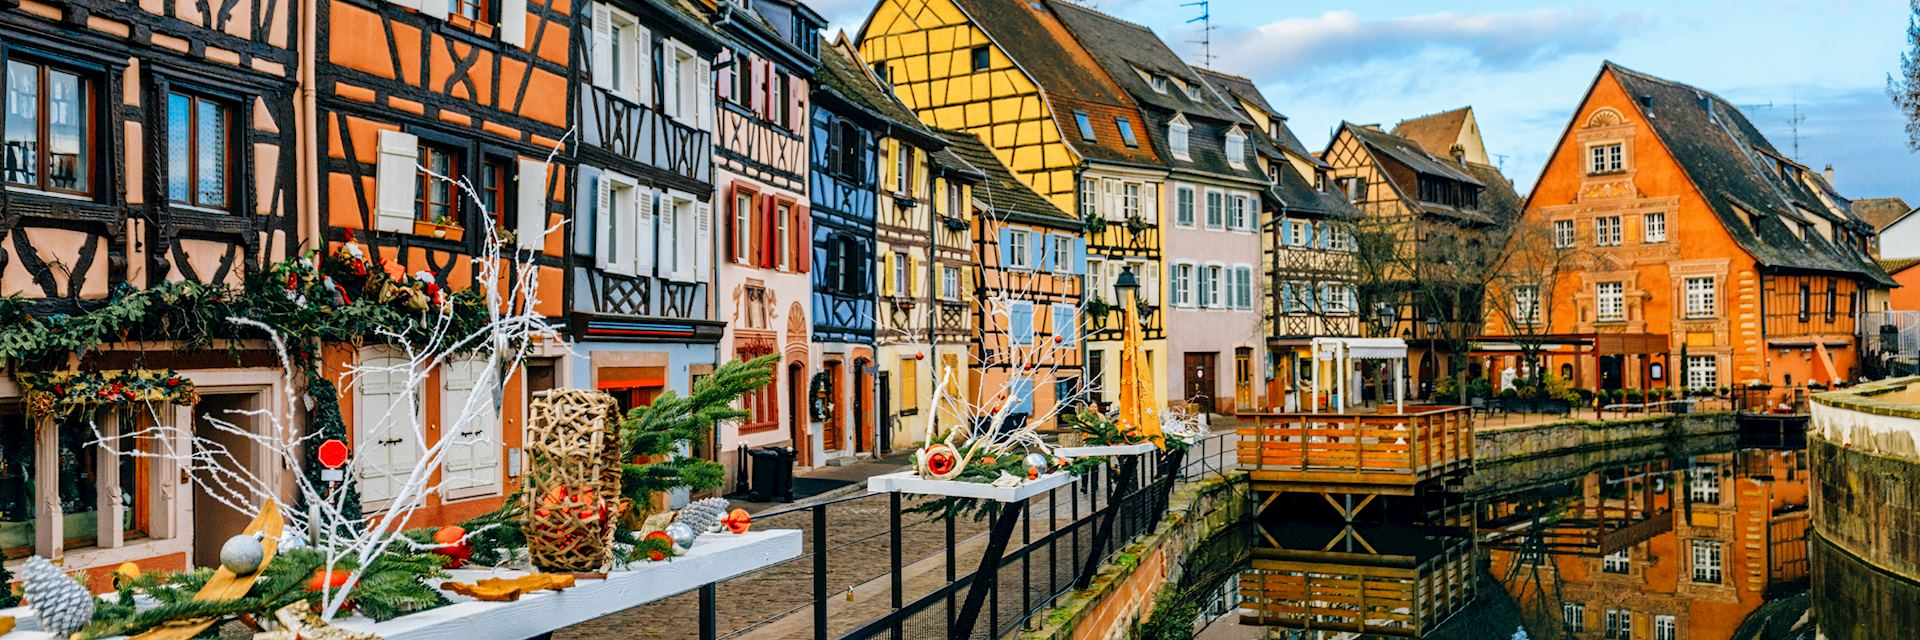 Houses in Petit Venice in Colmar, Alsace